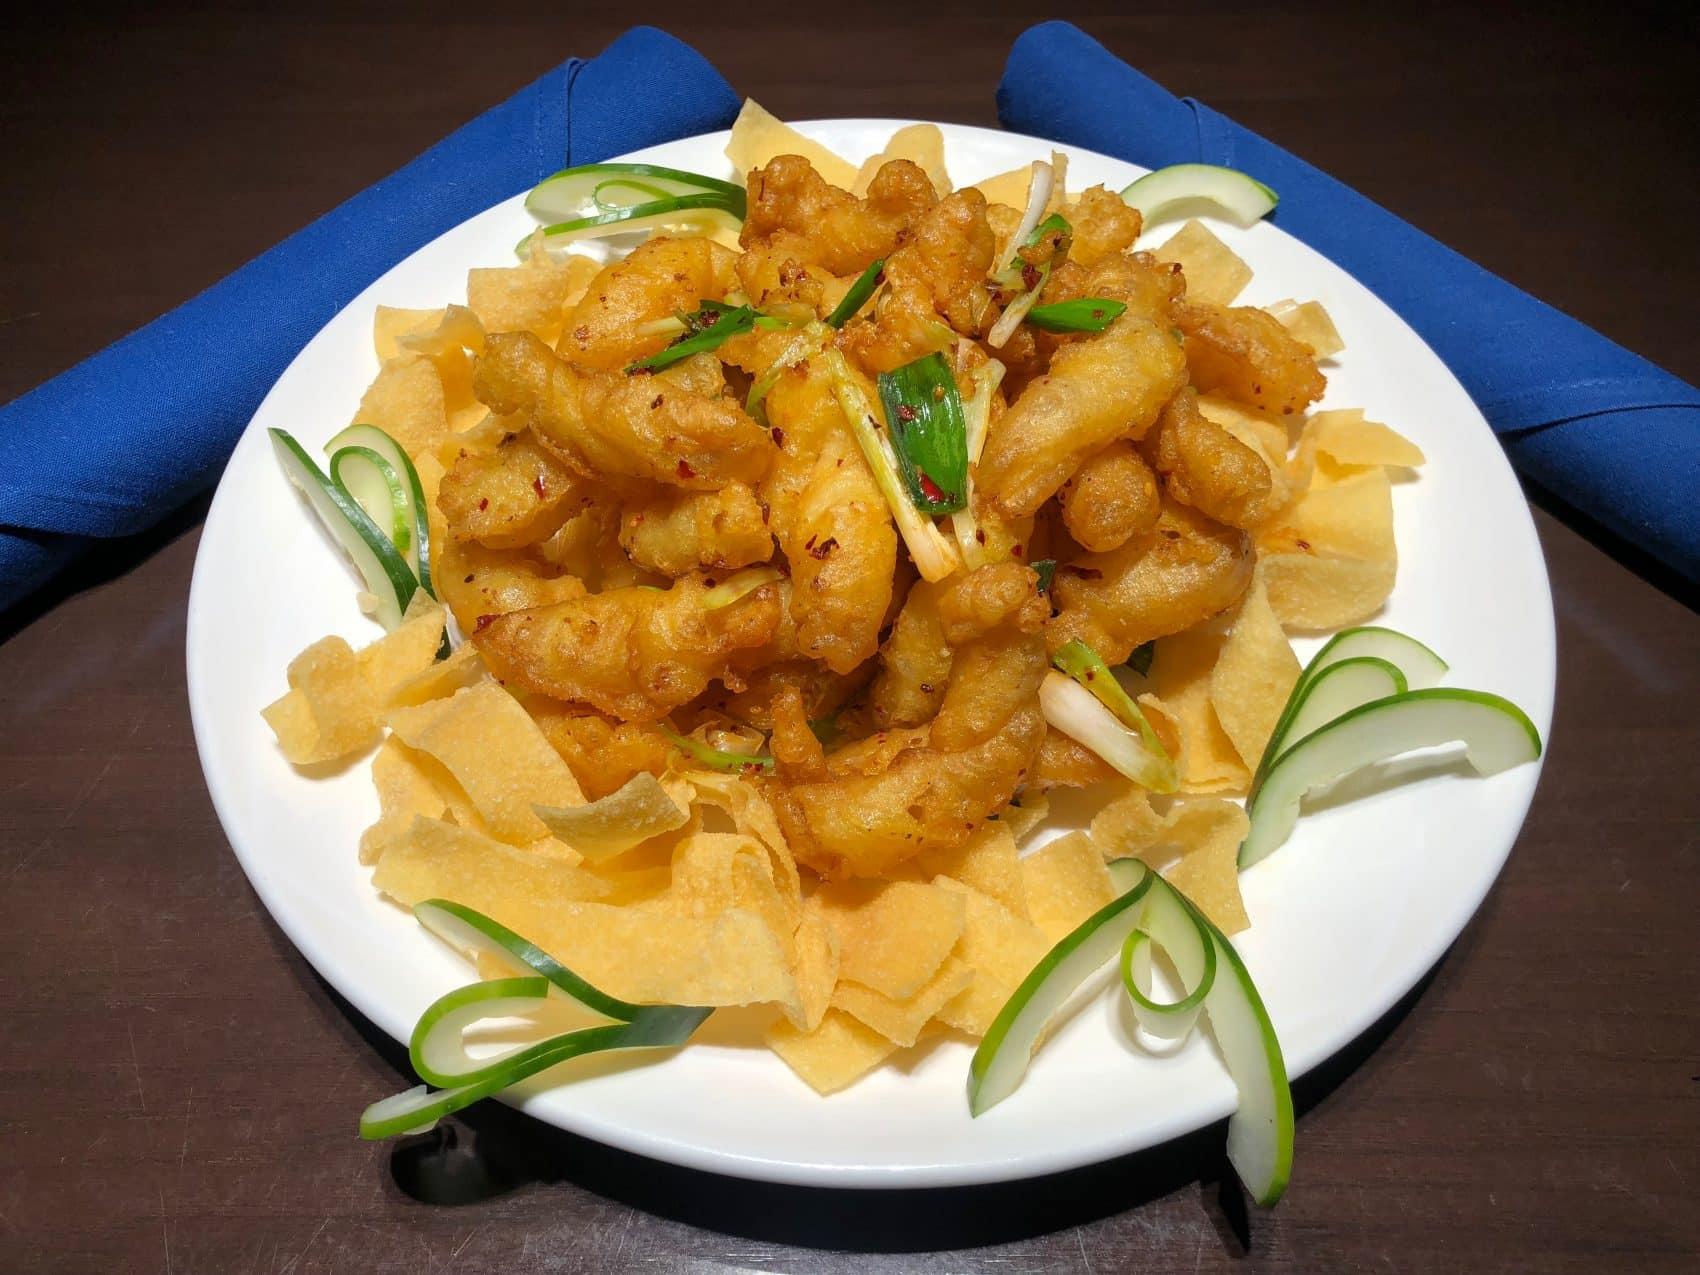 Crispy Calamari Basket - Rise Sushi - Creative Asian Cuisine